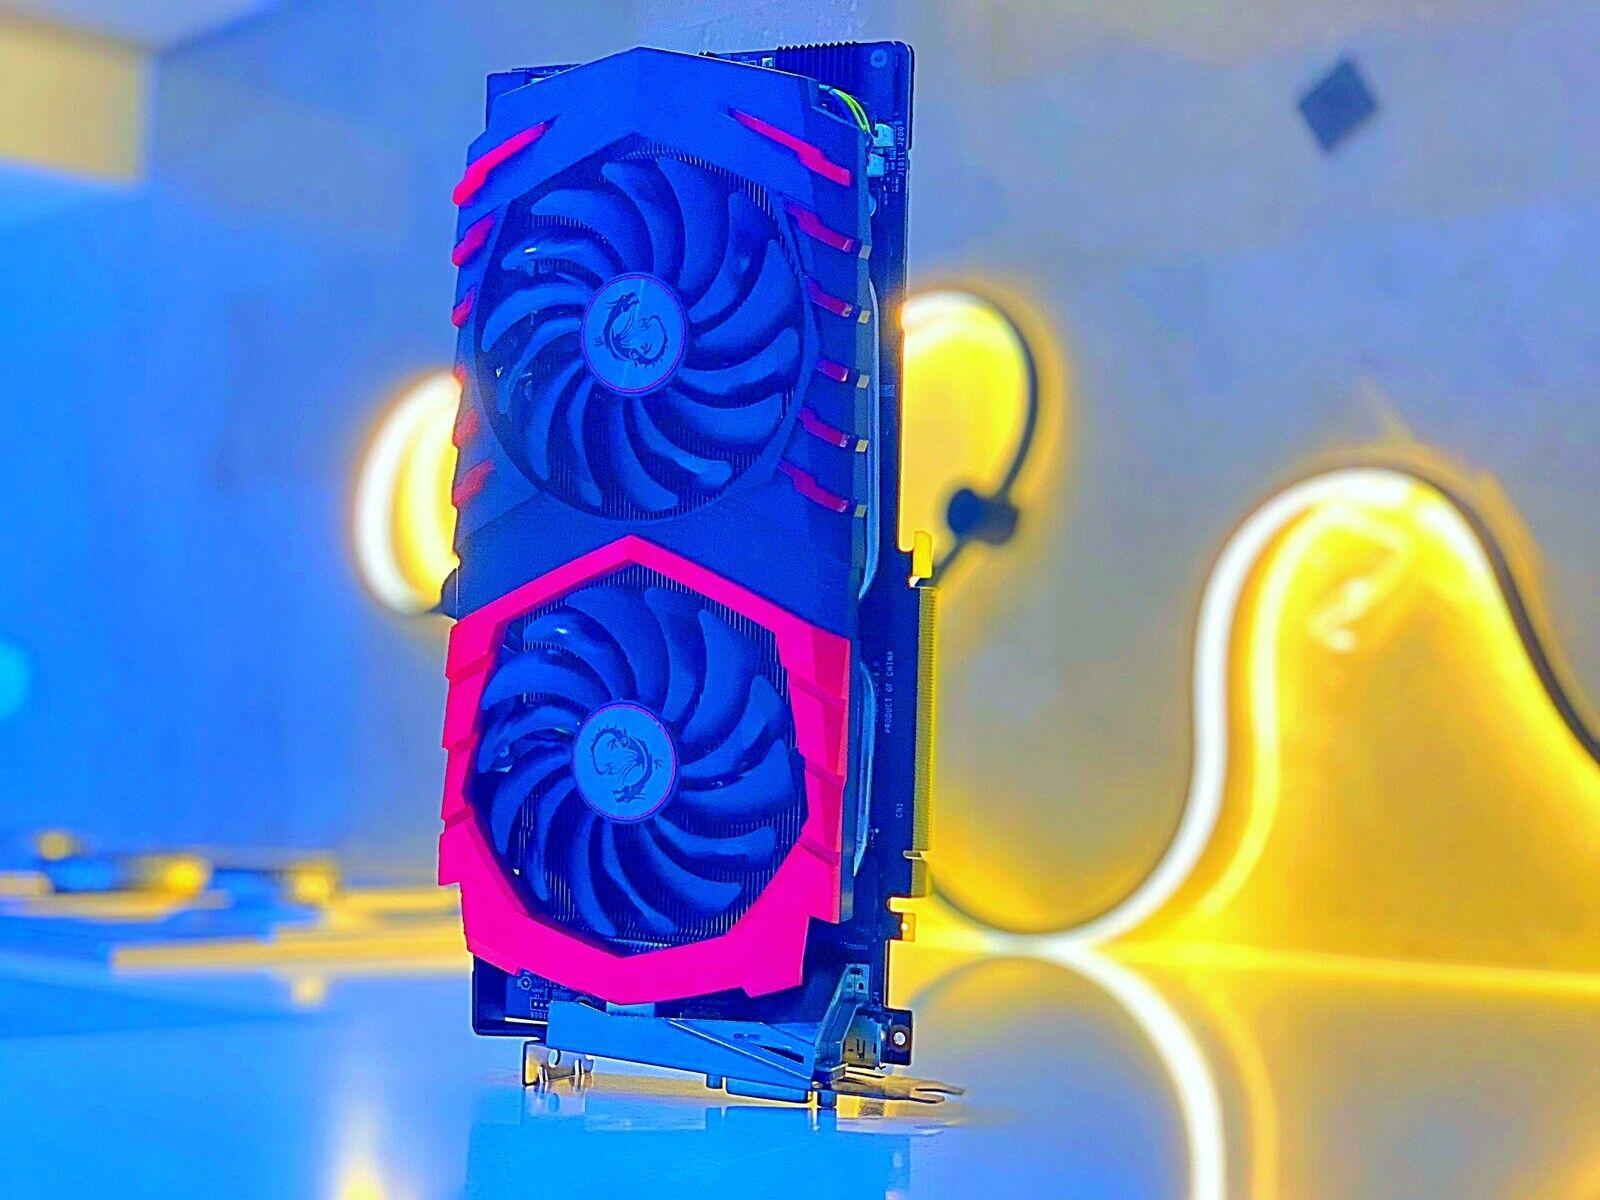 ༺ༀ༂ MSI GeForce GTX 1070 GAMING 8GB ® Gaming X ®Graphics Card DVI-Port-HDMI༂ༀ༻